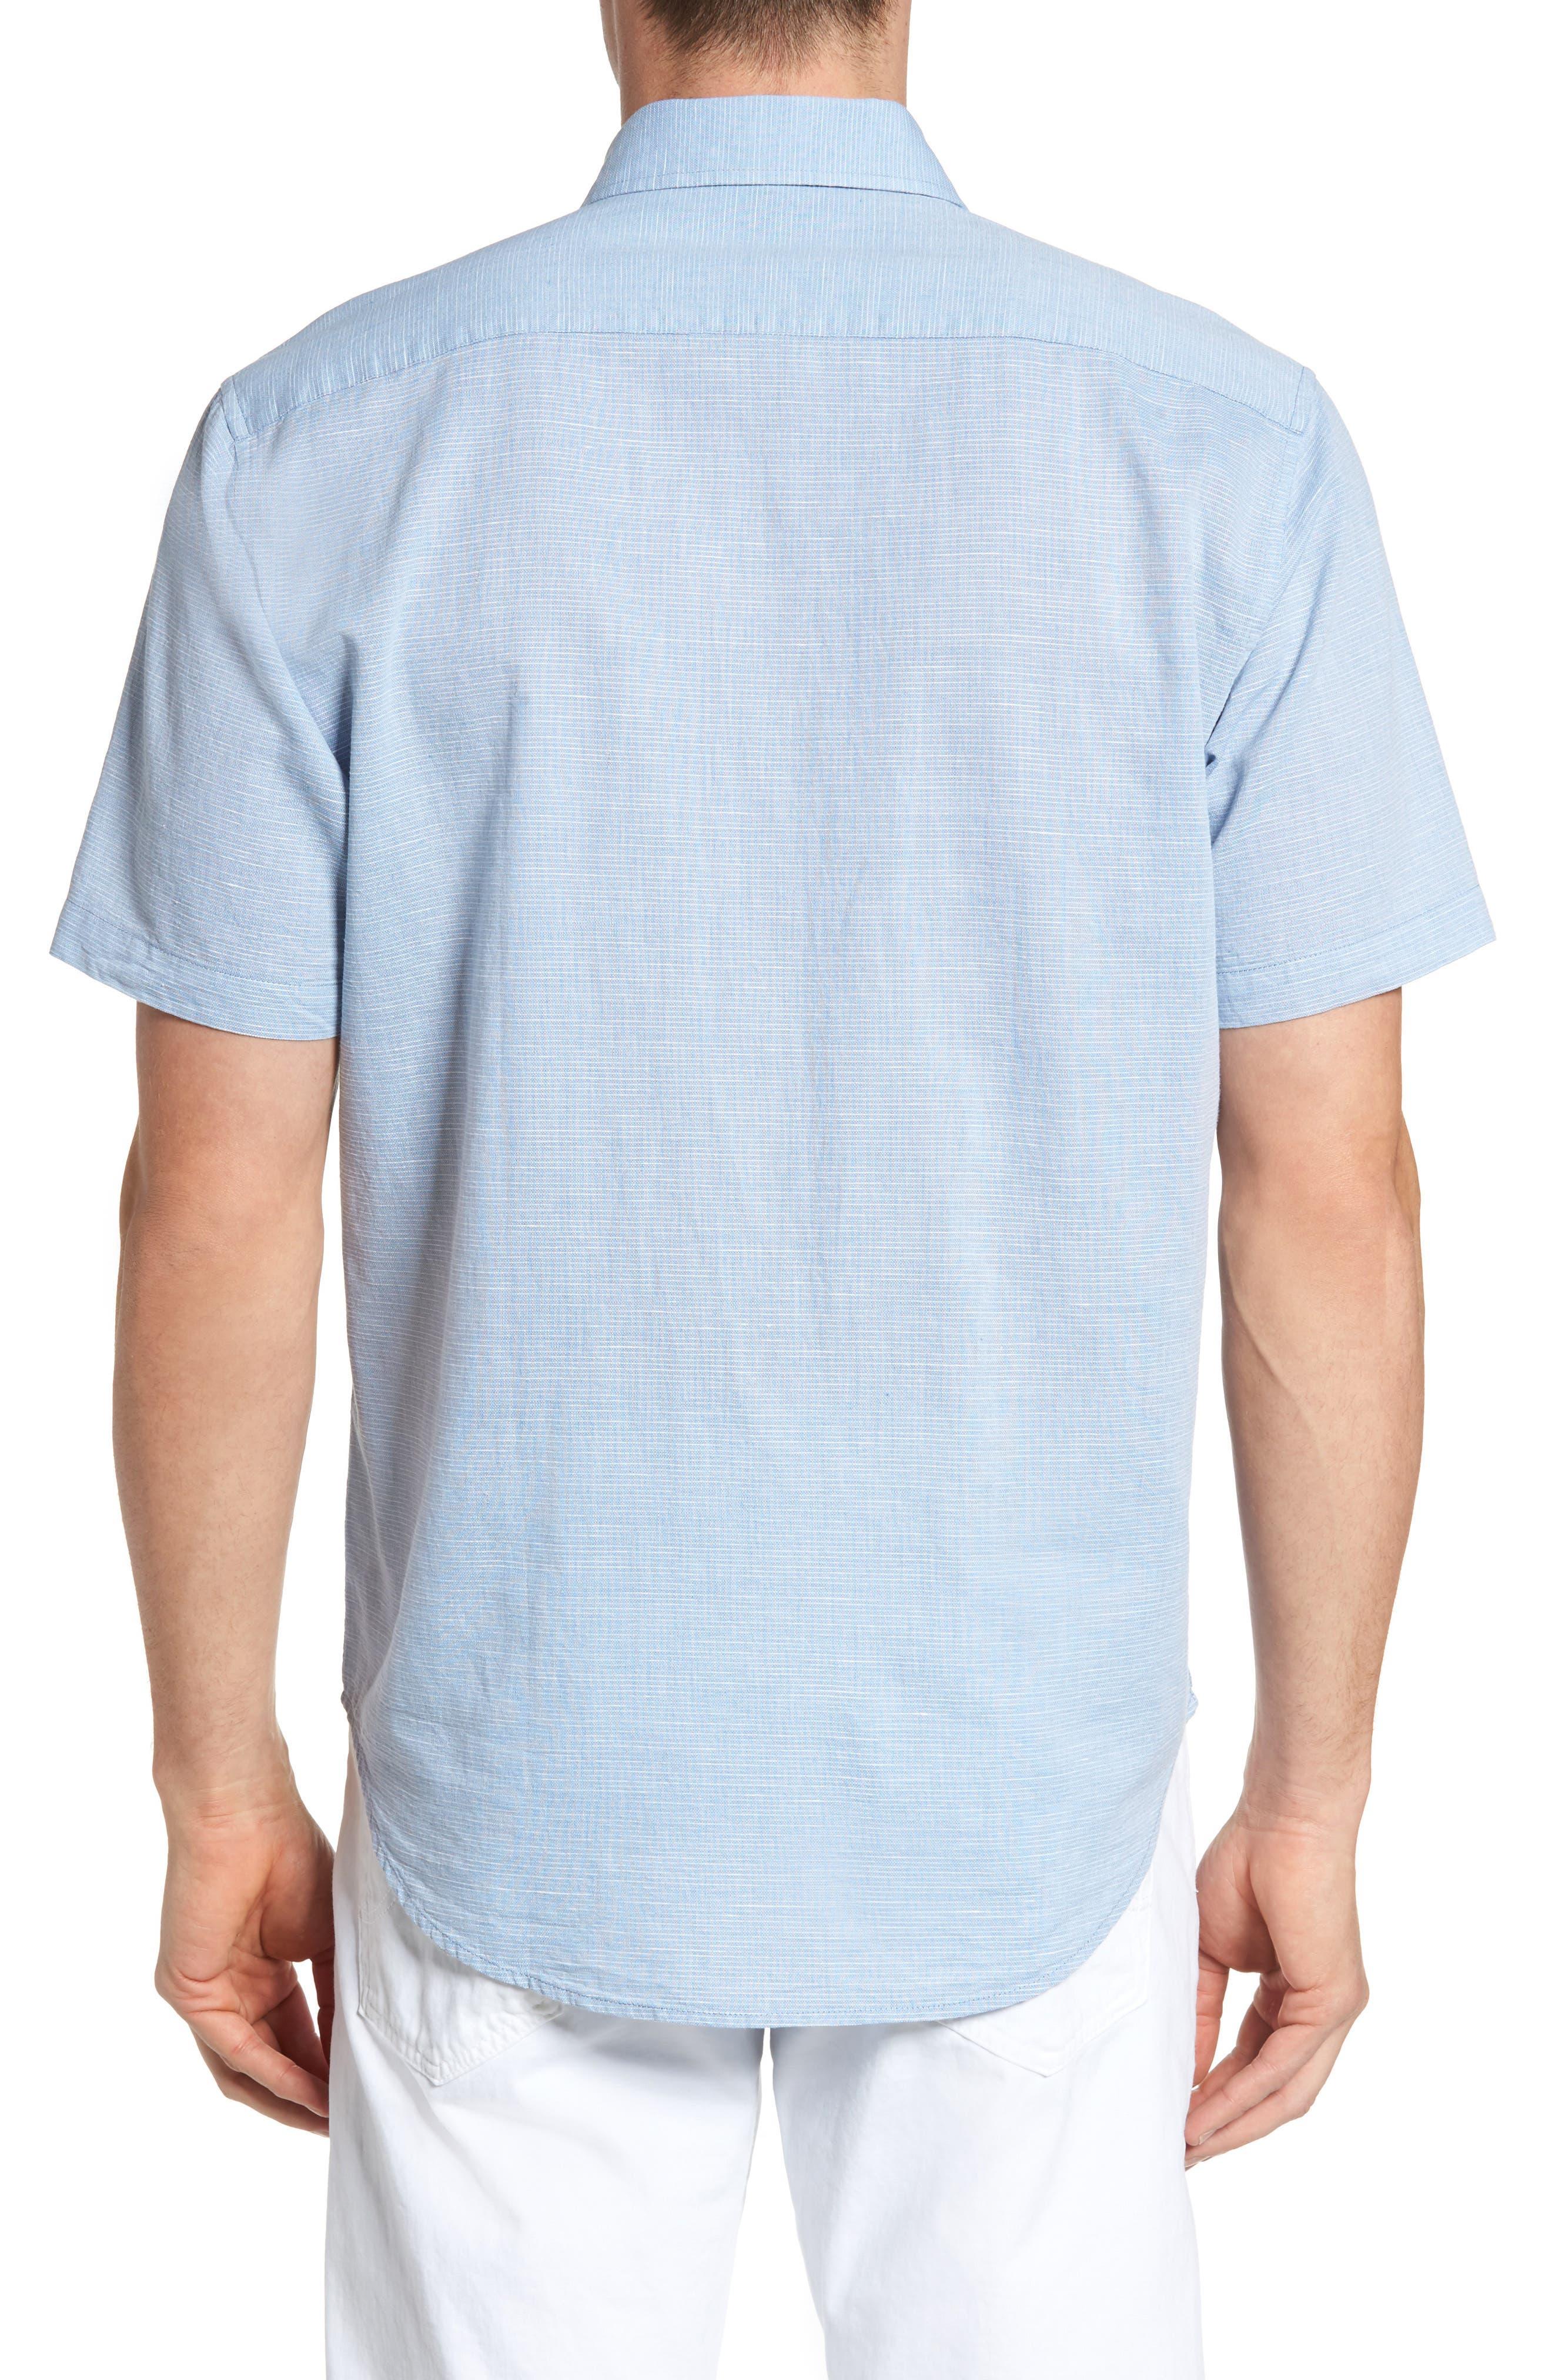 Alternate Image 2  - James Campbell 'Ellerbe' Regular Fit Short Sleeve Sport Shirt